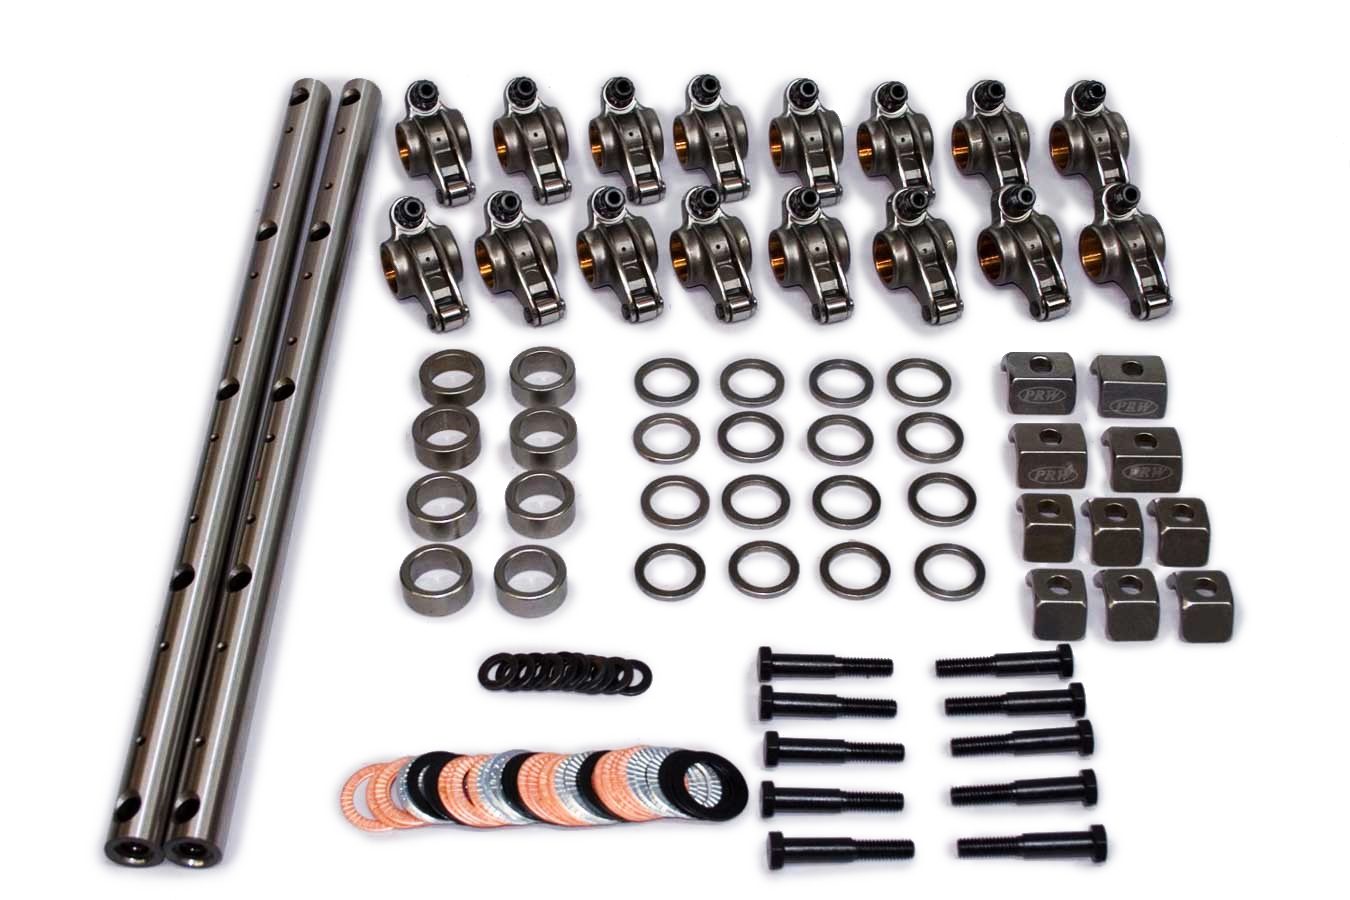 PRW Industries 3244013 Rocker Arm, Shaft Mount, 1.70 Ratio, Roller Tip, Steel, Natural, Mopar B / RB Series, Kit